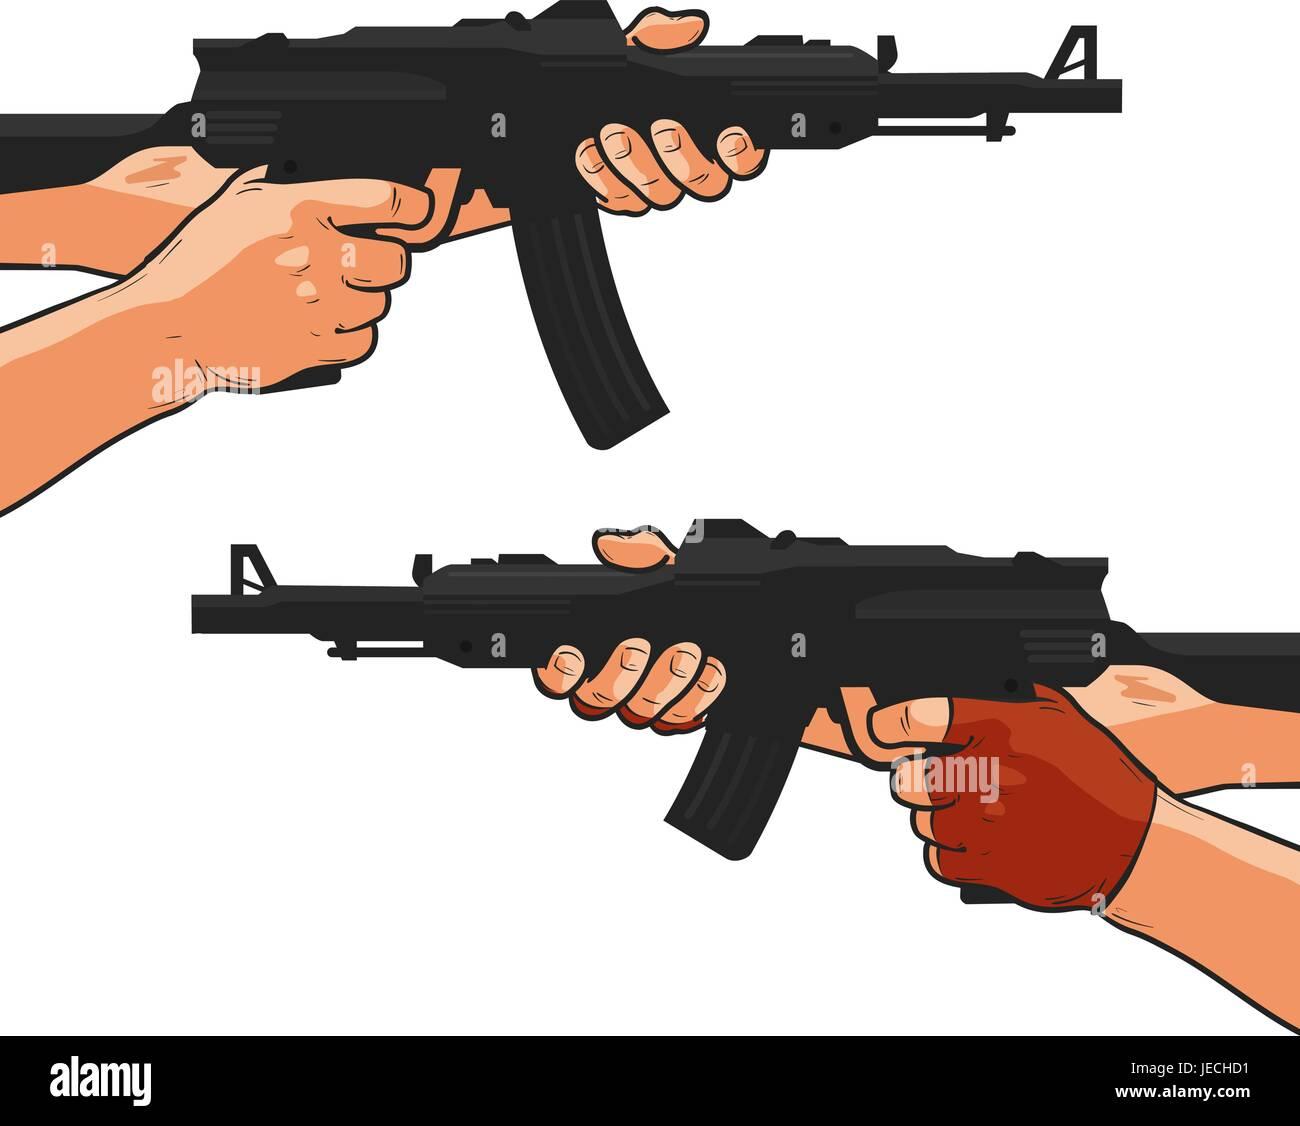 Assault rifle, small arm, machine gun, shotgun. Cartoon comics style vector illustration - Stock Vector